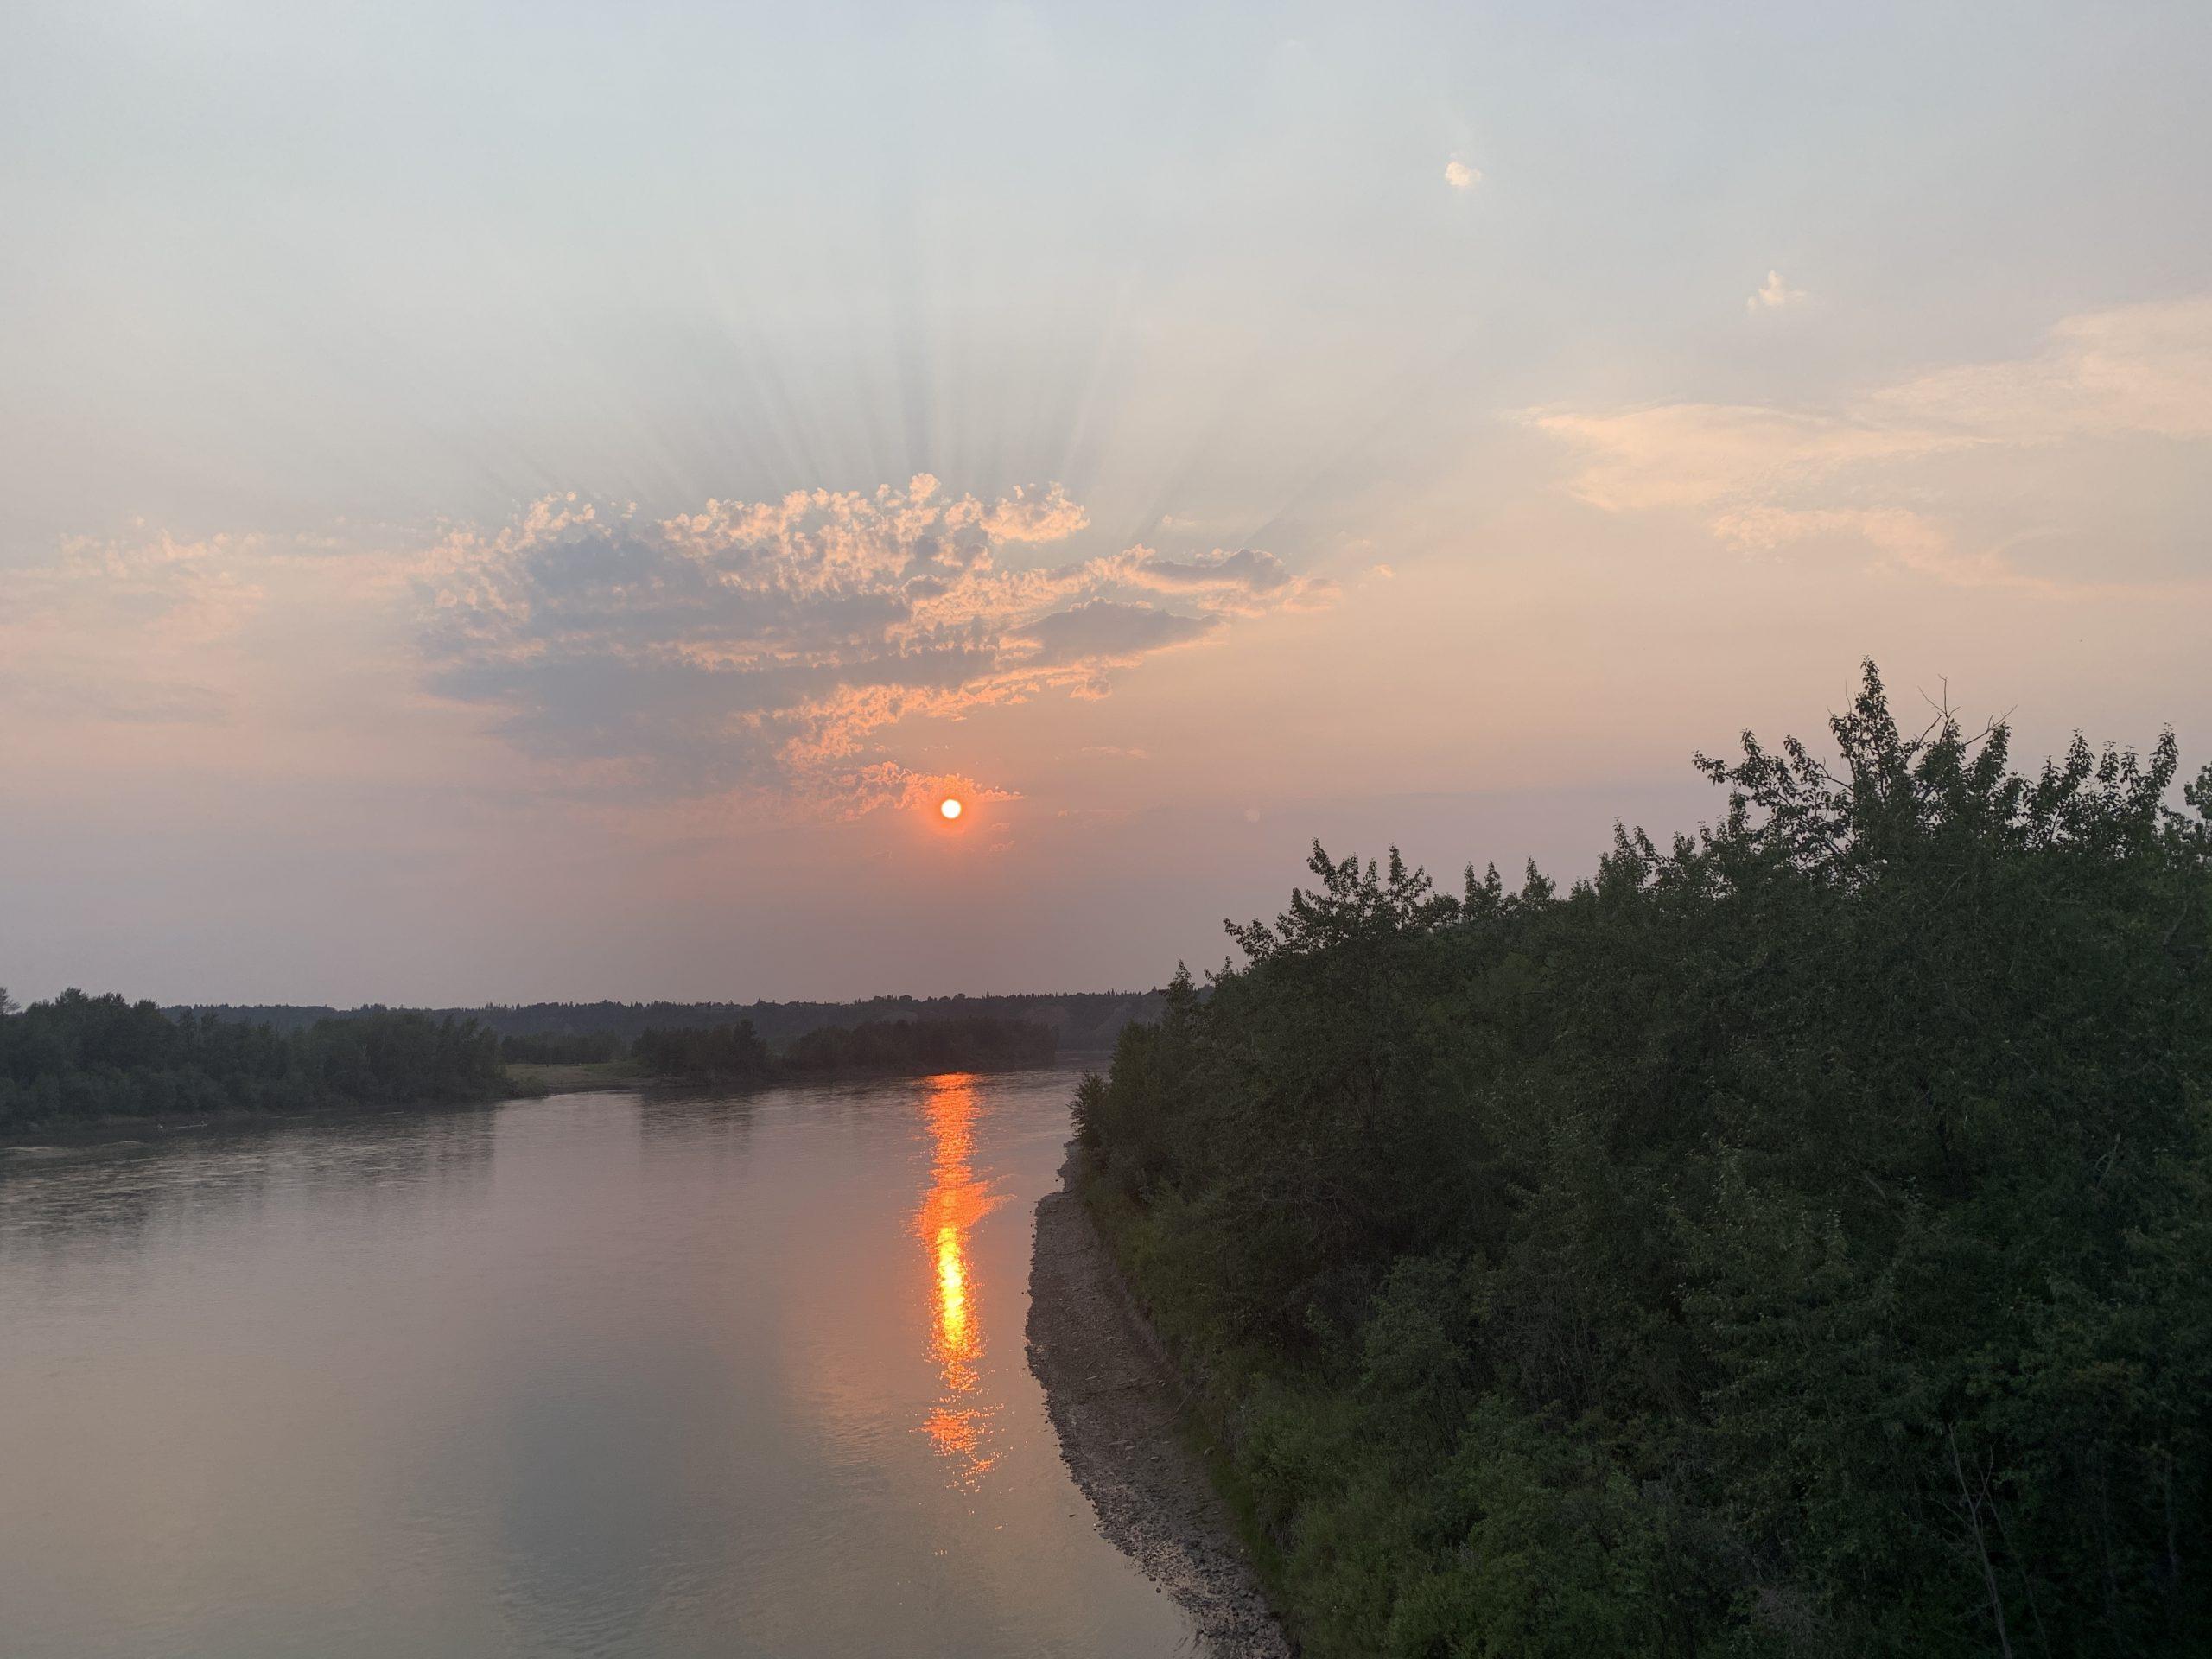 An orange hazy sun sets over a river.